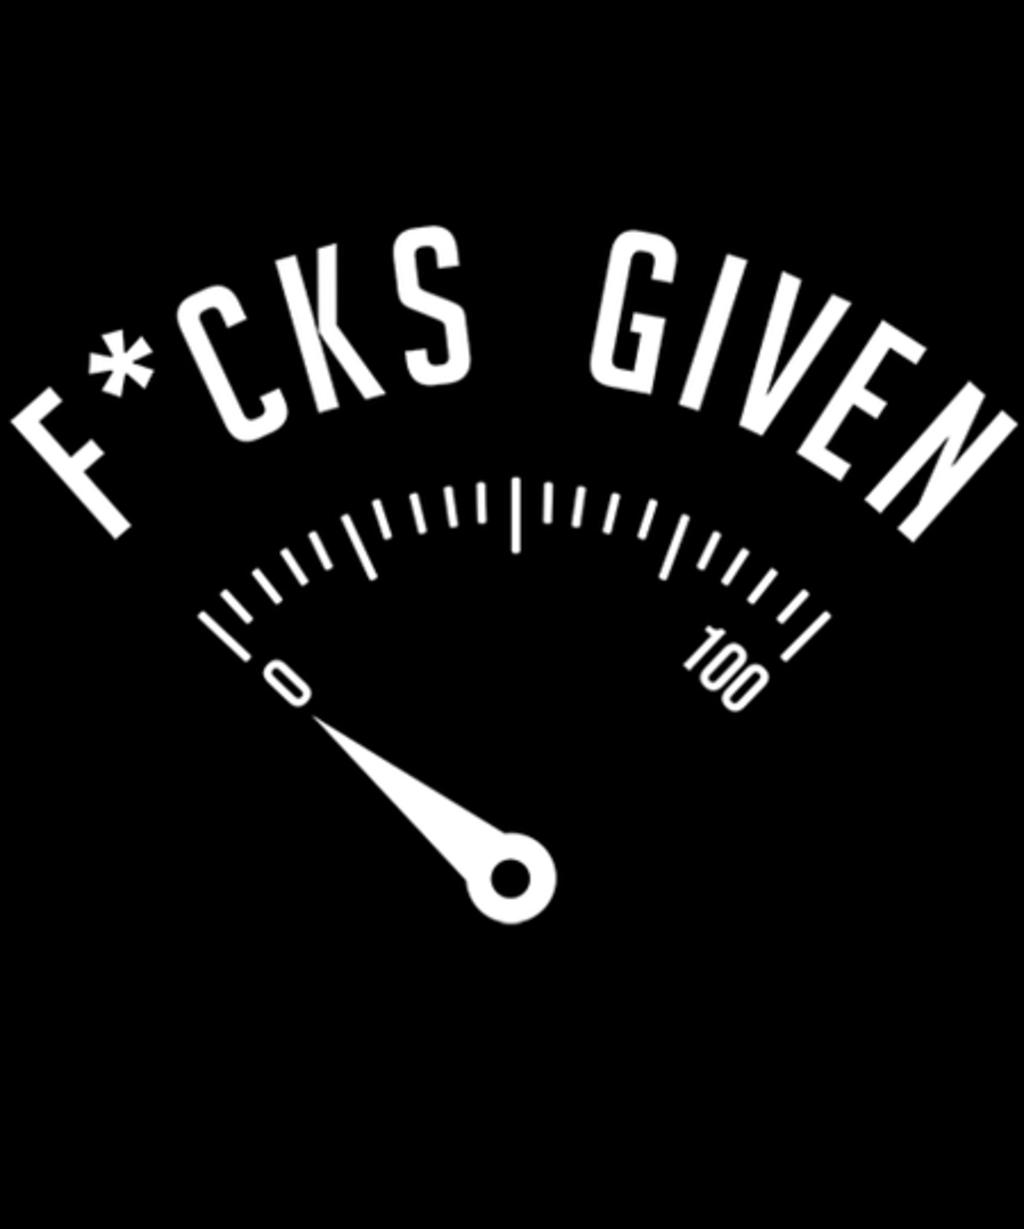 Qwertee: Zero f*cks given